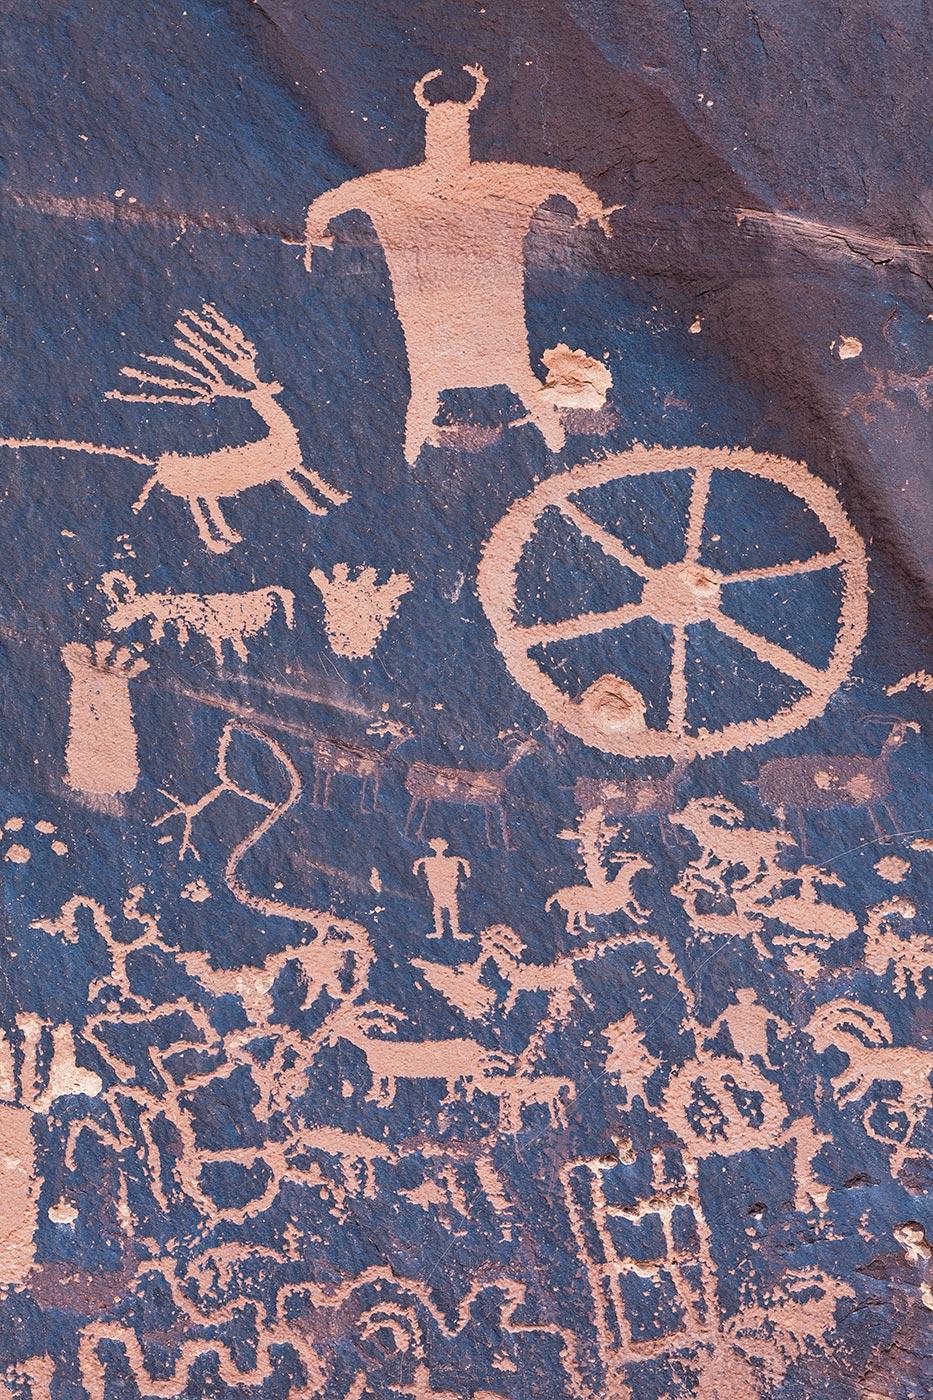 Ancient-Cultures_ABP_Newspaper-Rock.jpg